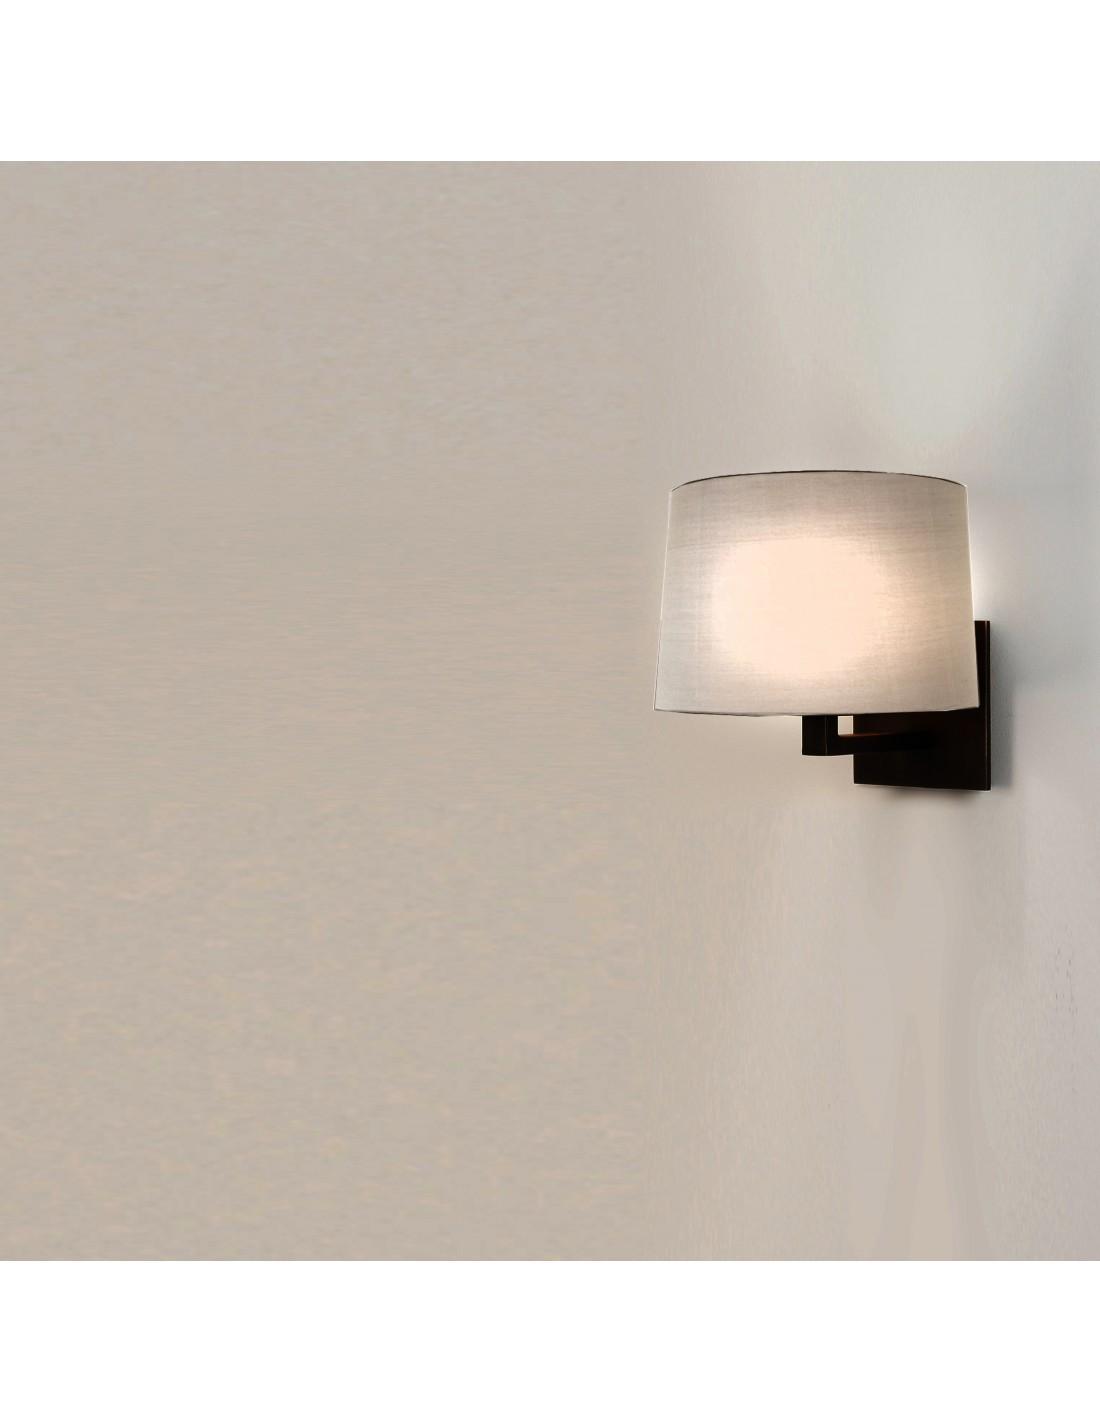 applique mural azumi bronze abat jour rond tissu hu tre astro lighting mise en sc ne. Black Bedroom Furniture Sets. Home Design Ideas